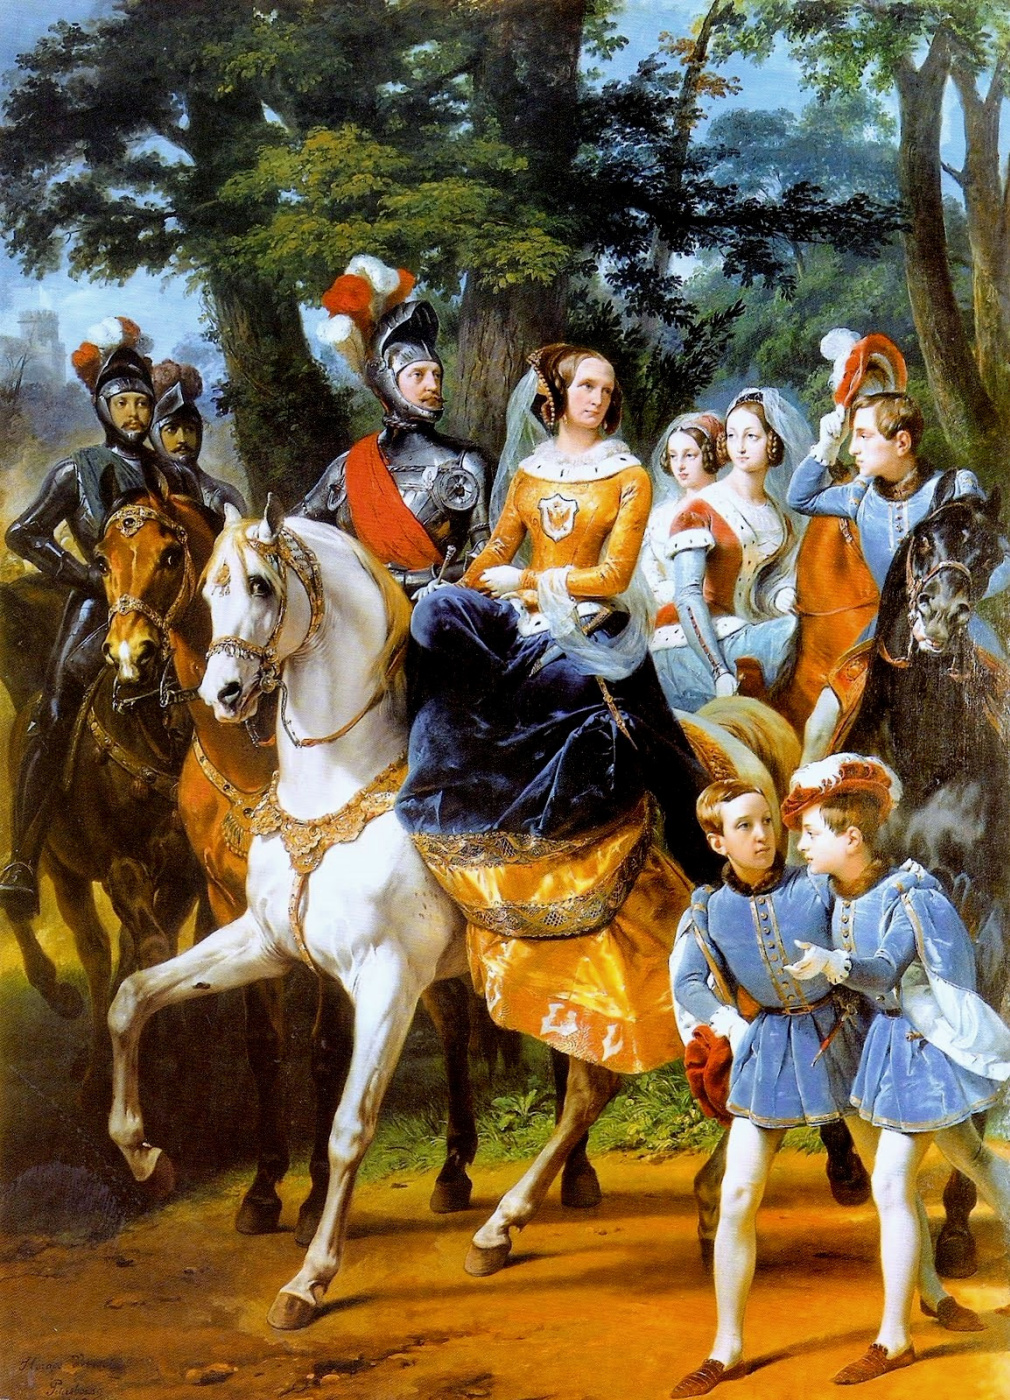 Emil-Jean-Oras Vernet. Tsarskoye Selo carousel. Family of Emperor Nicholas I in fancy dress